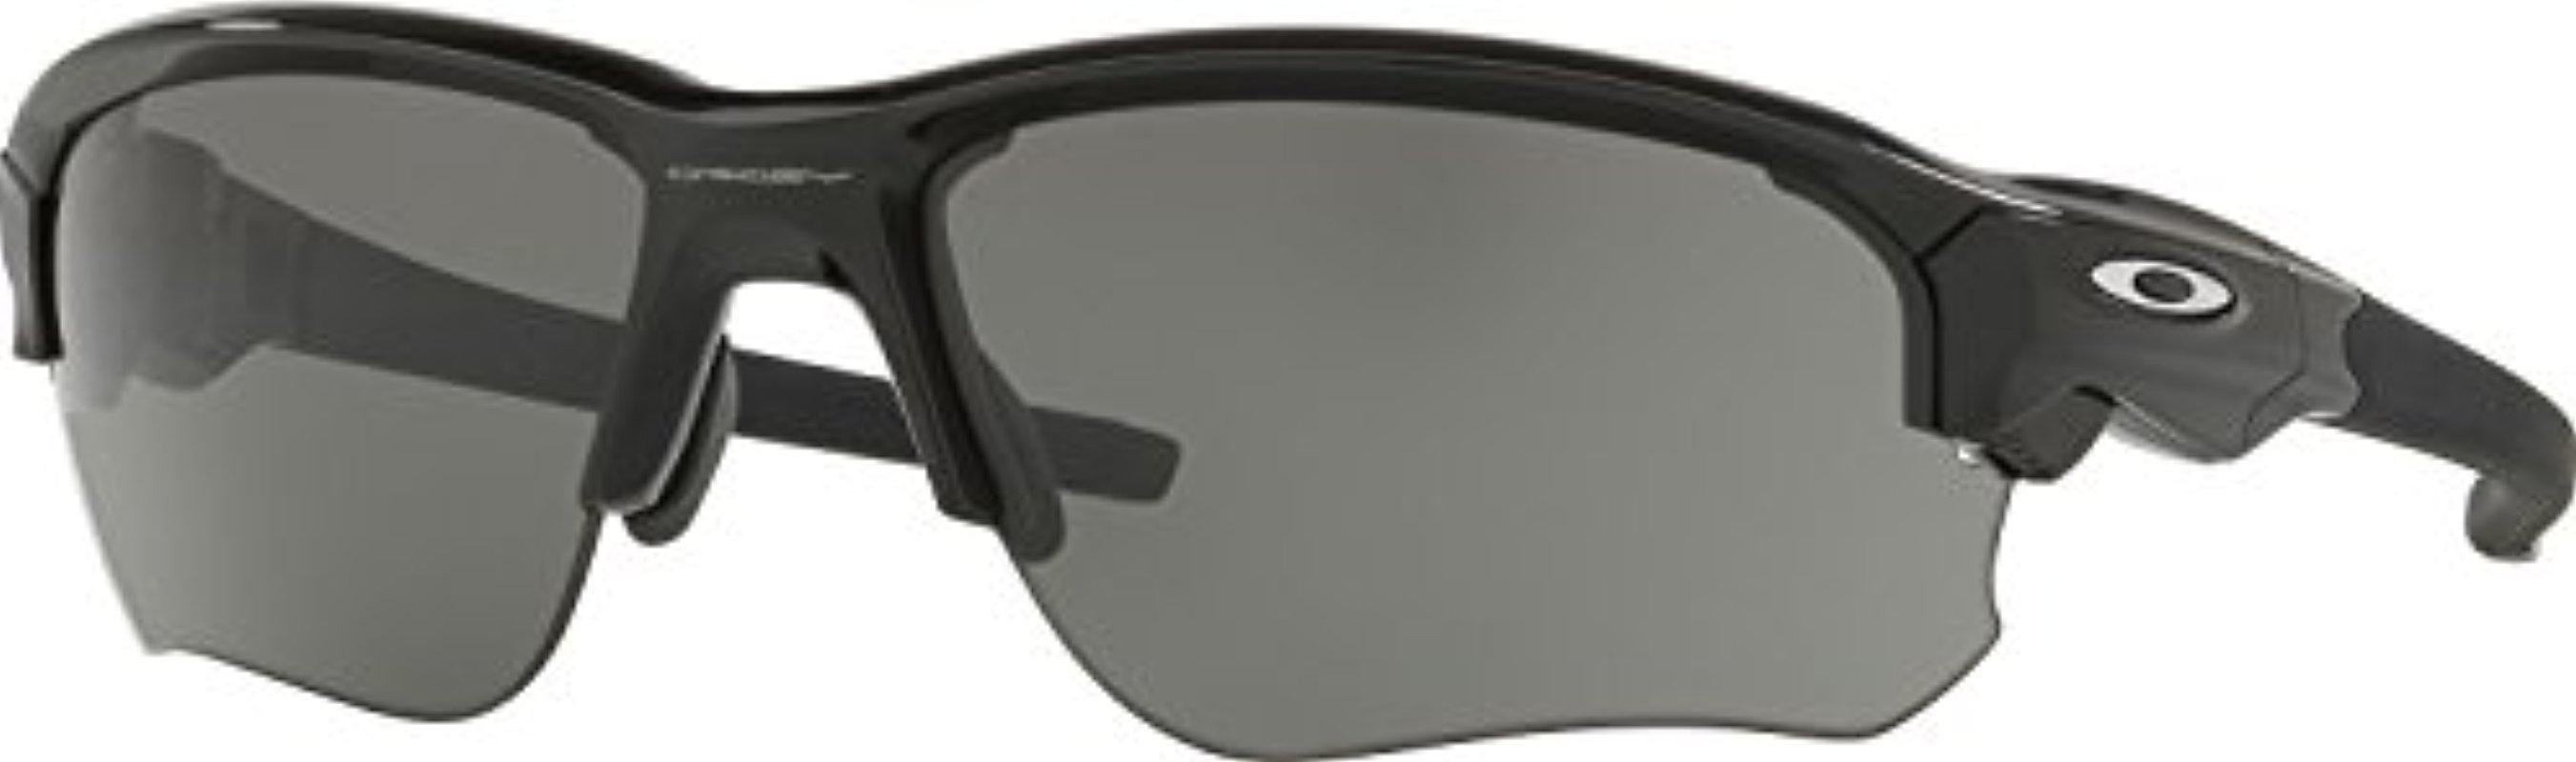 b7809143965 Lyst - Oakley Flak Draft Sunglasses in Black for Men - Save 48%